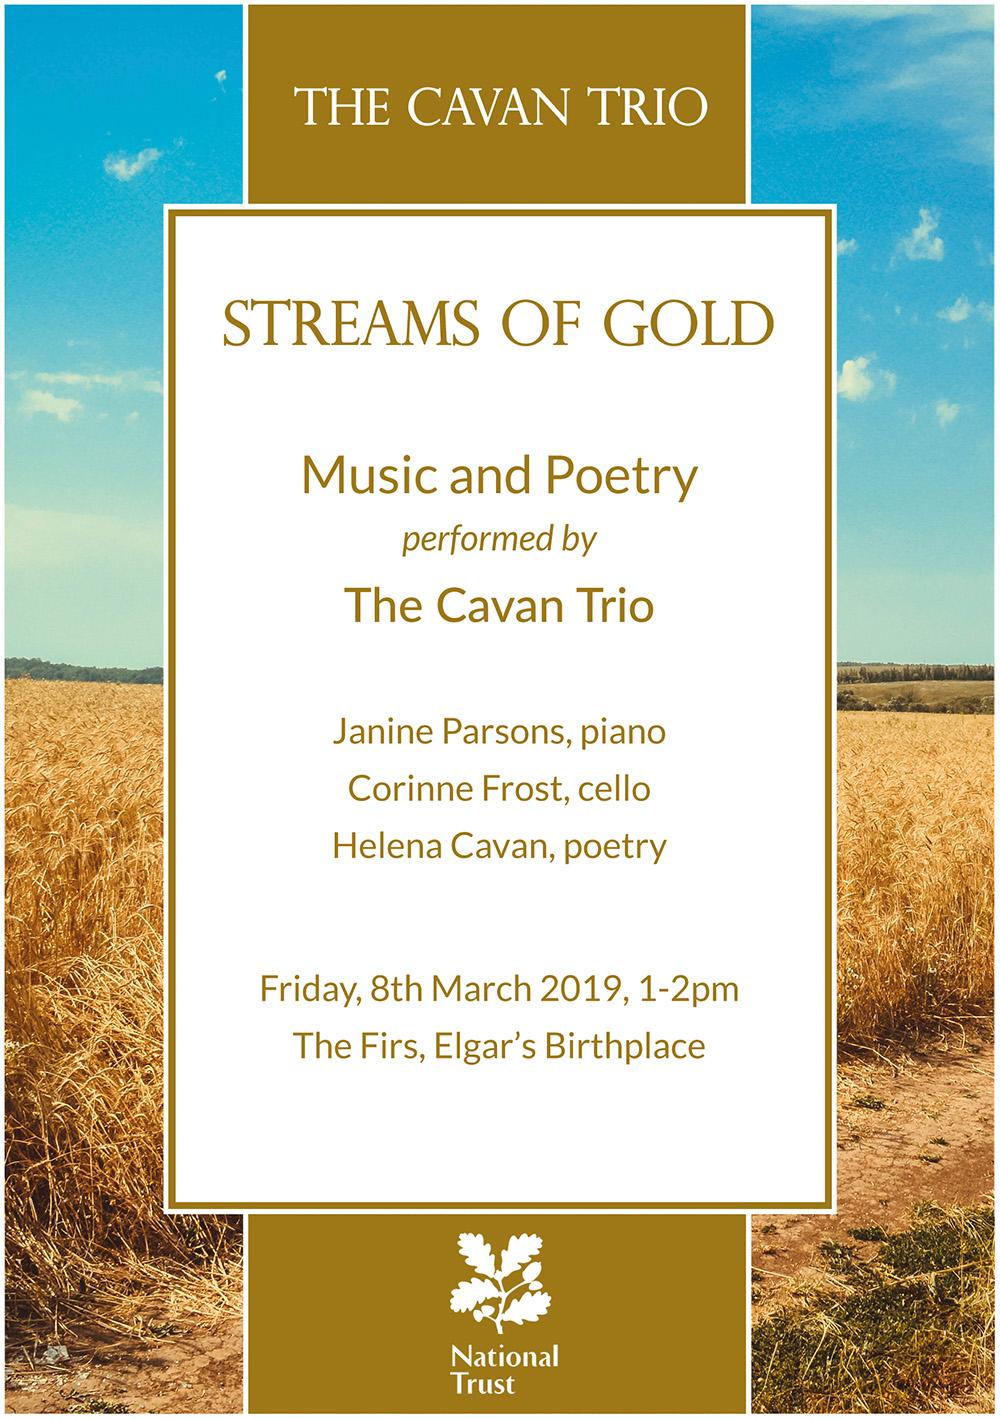 Streams of gold programme 1.jpg